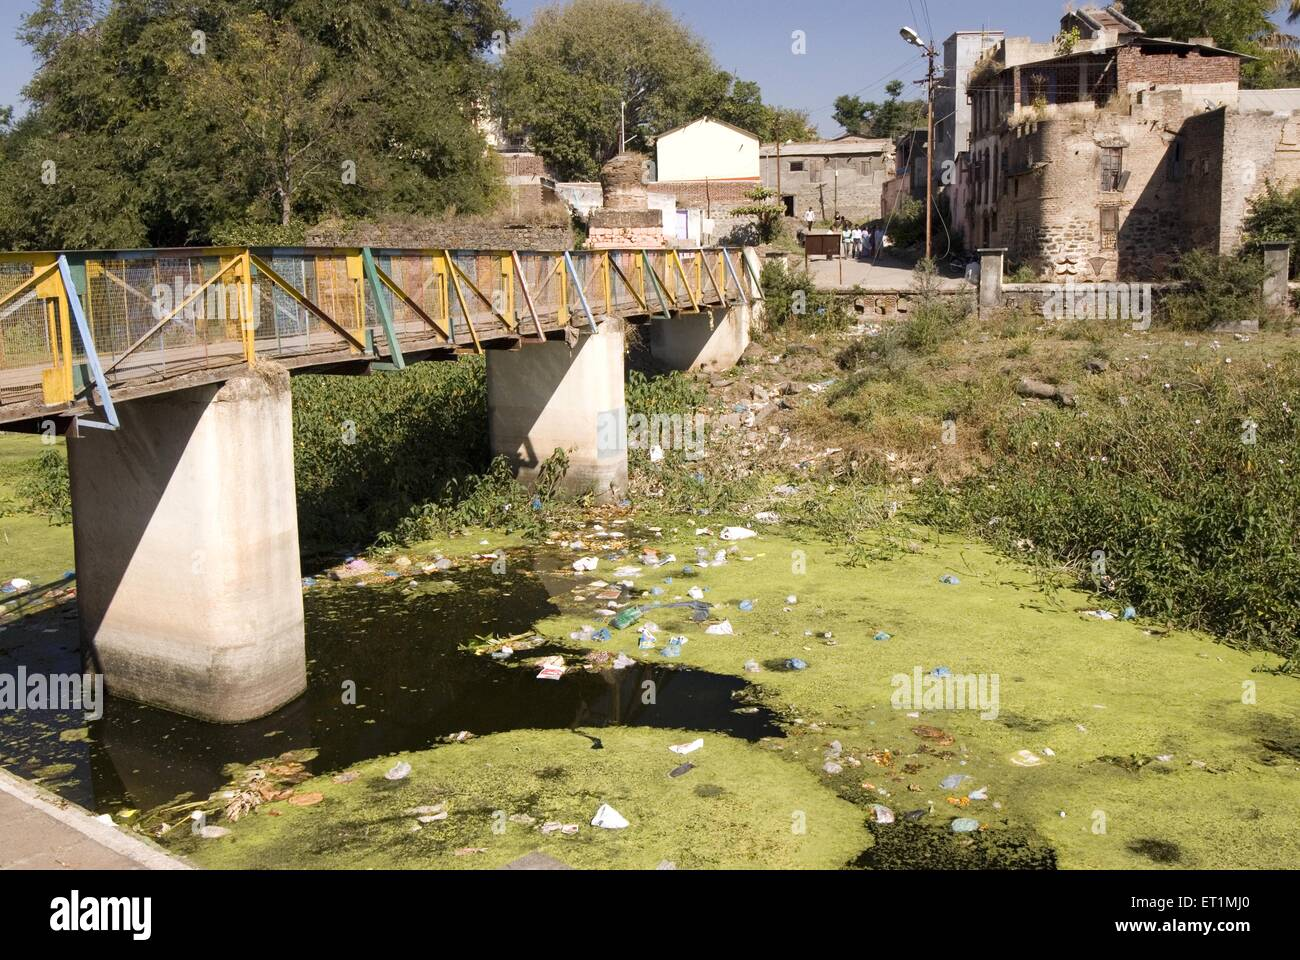 Pollution river turns into garbage dump people throw rubbish river karh Sasvad village taluka Purandar Pune maharashtra - Stock Image